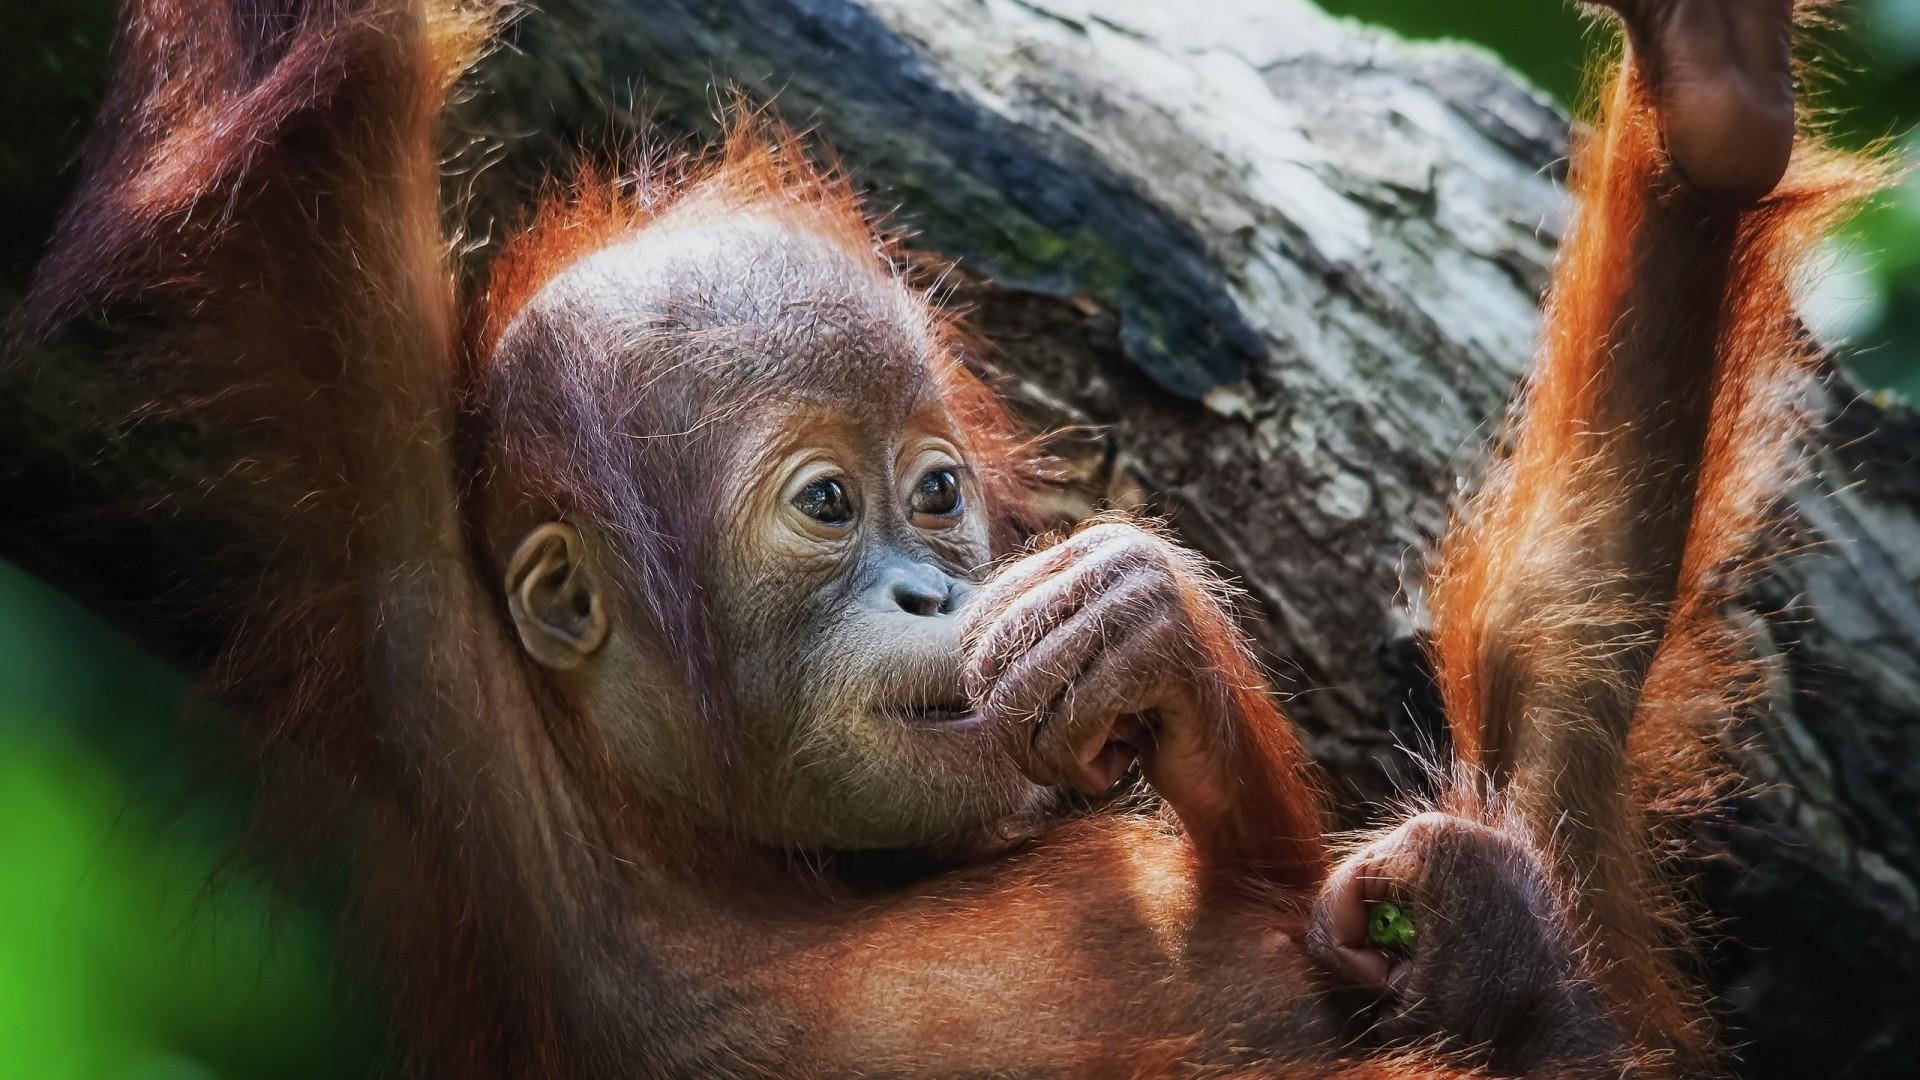 Wallpaper monkey, face, baby, lie